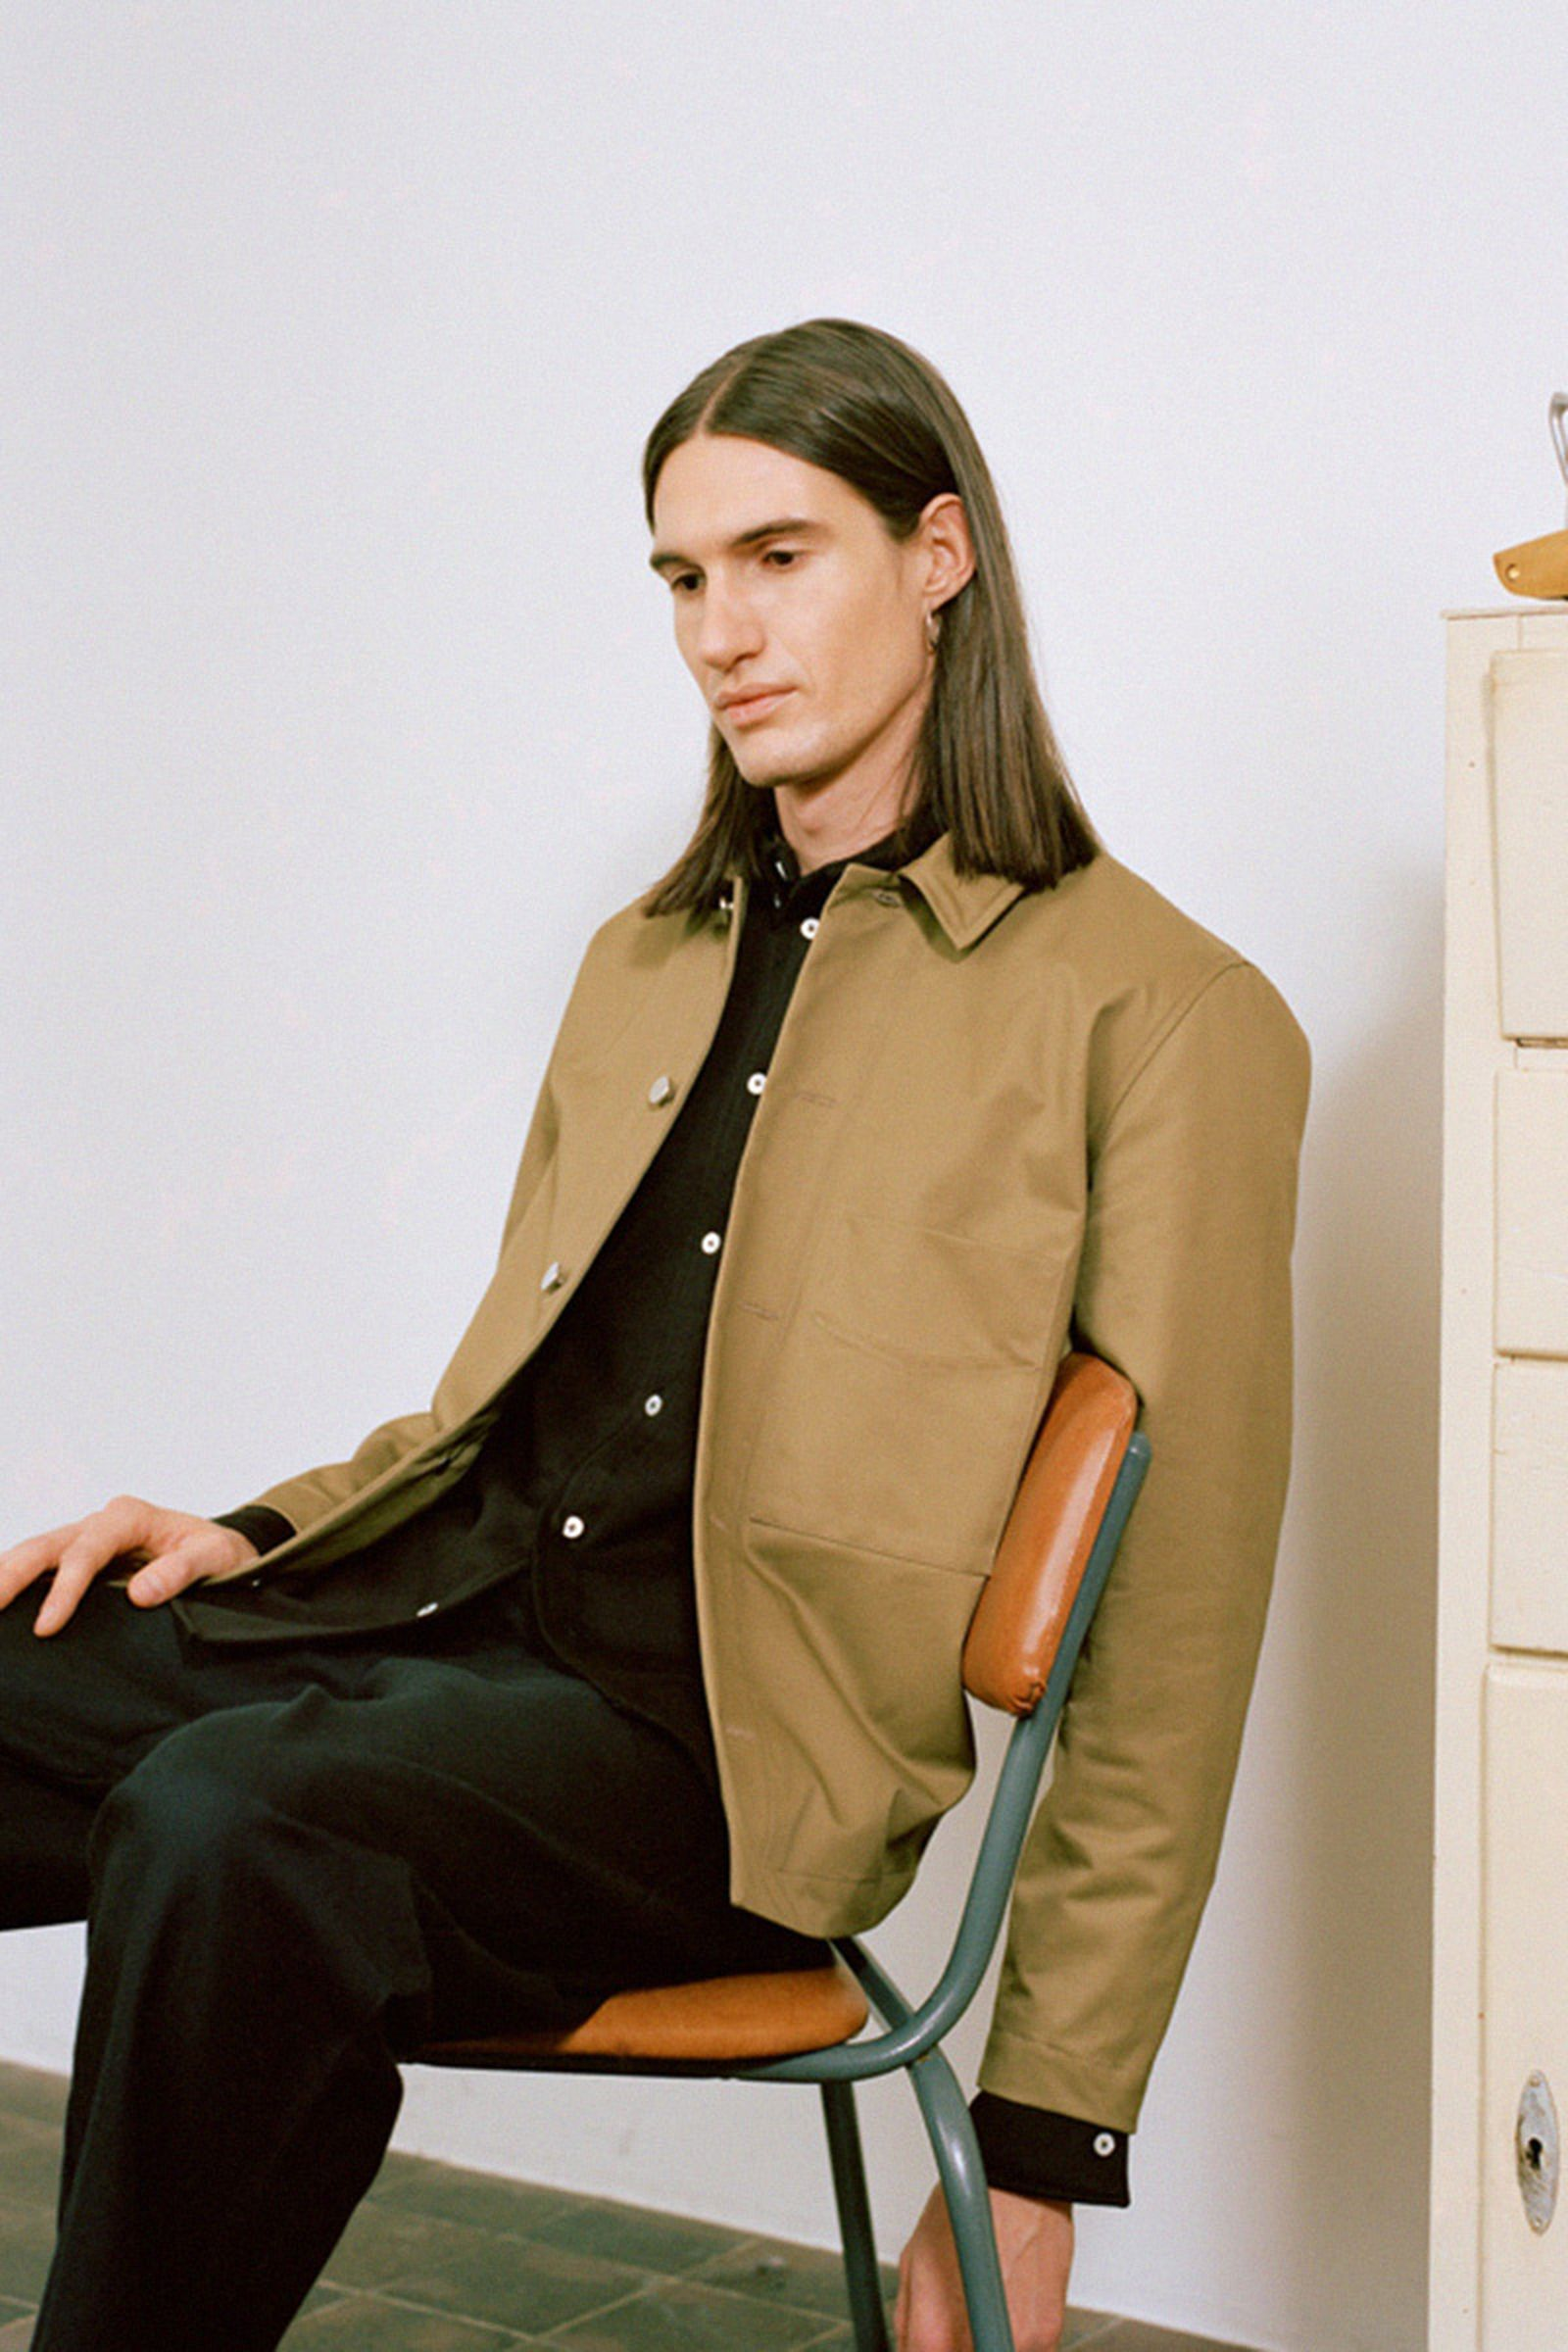 german clothing brands frisur 023c Adidas Boulezar